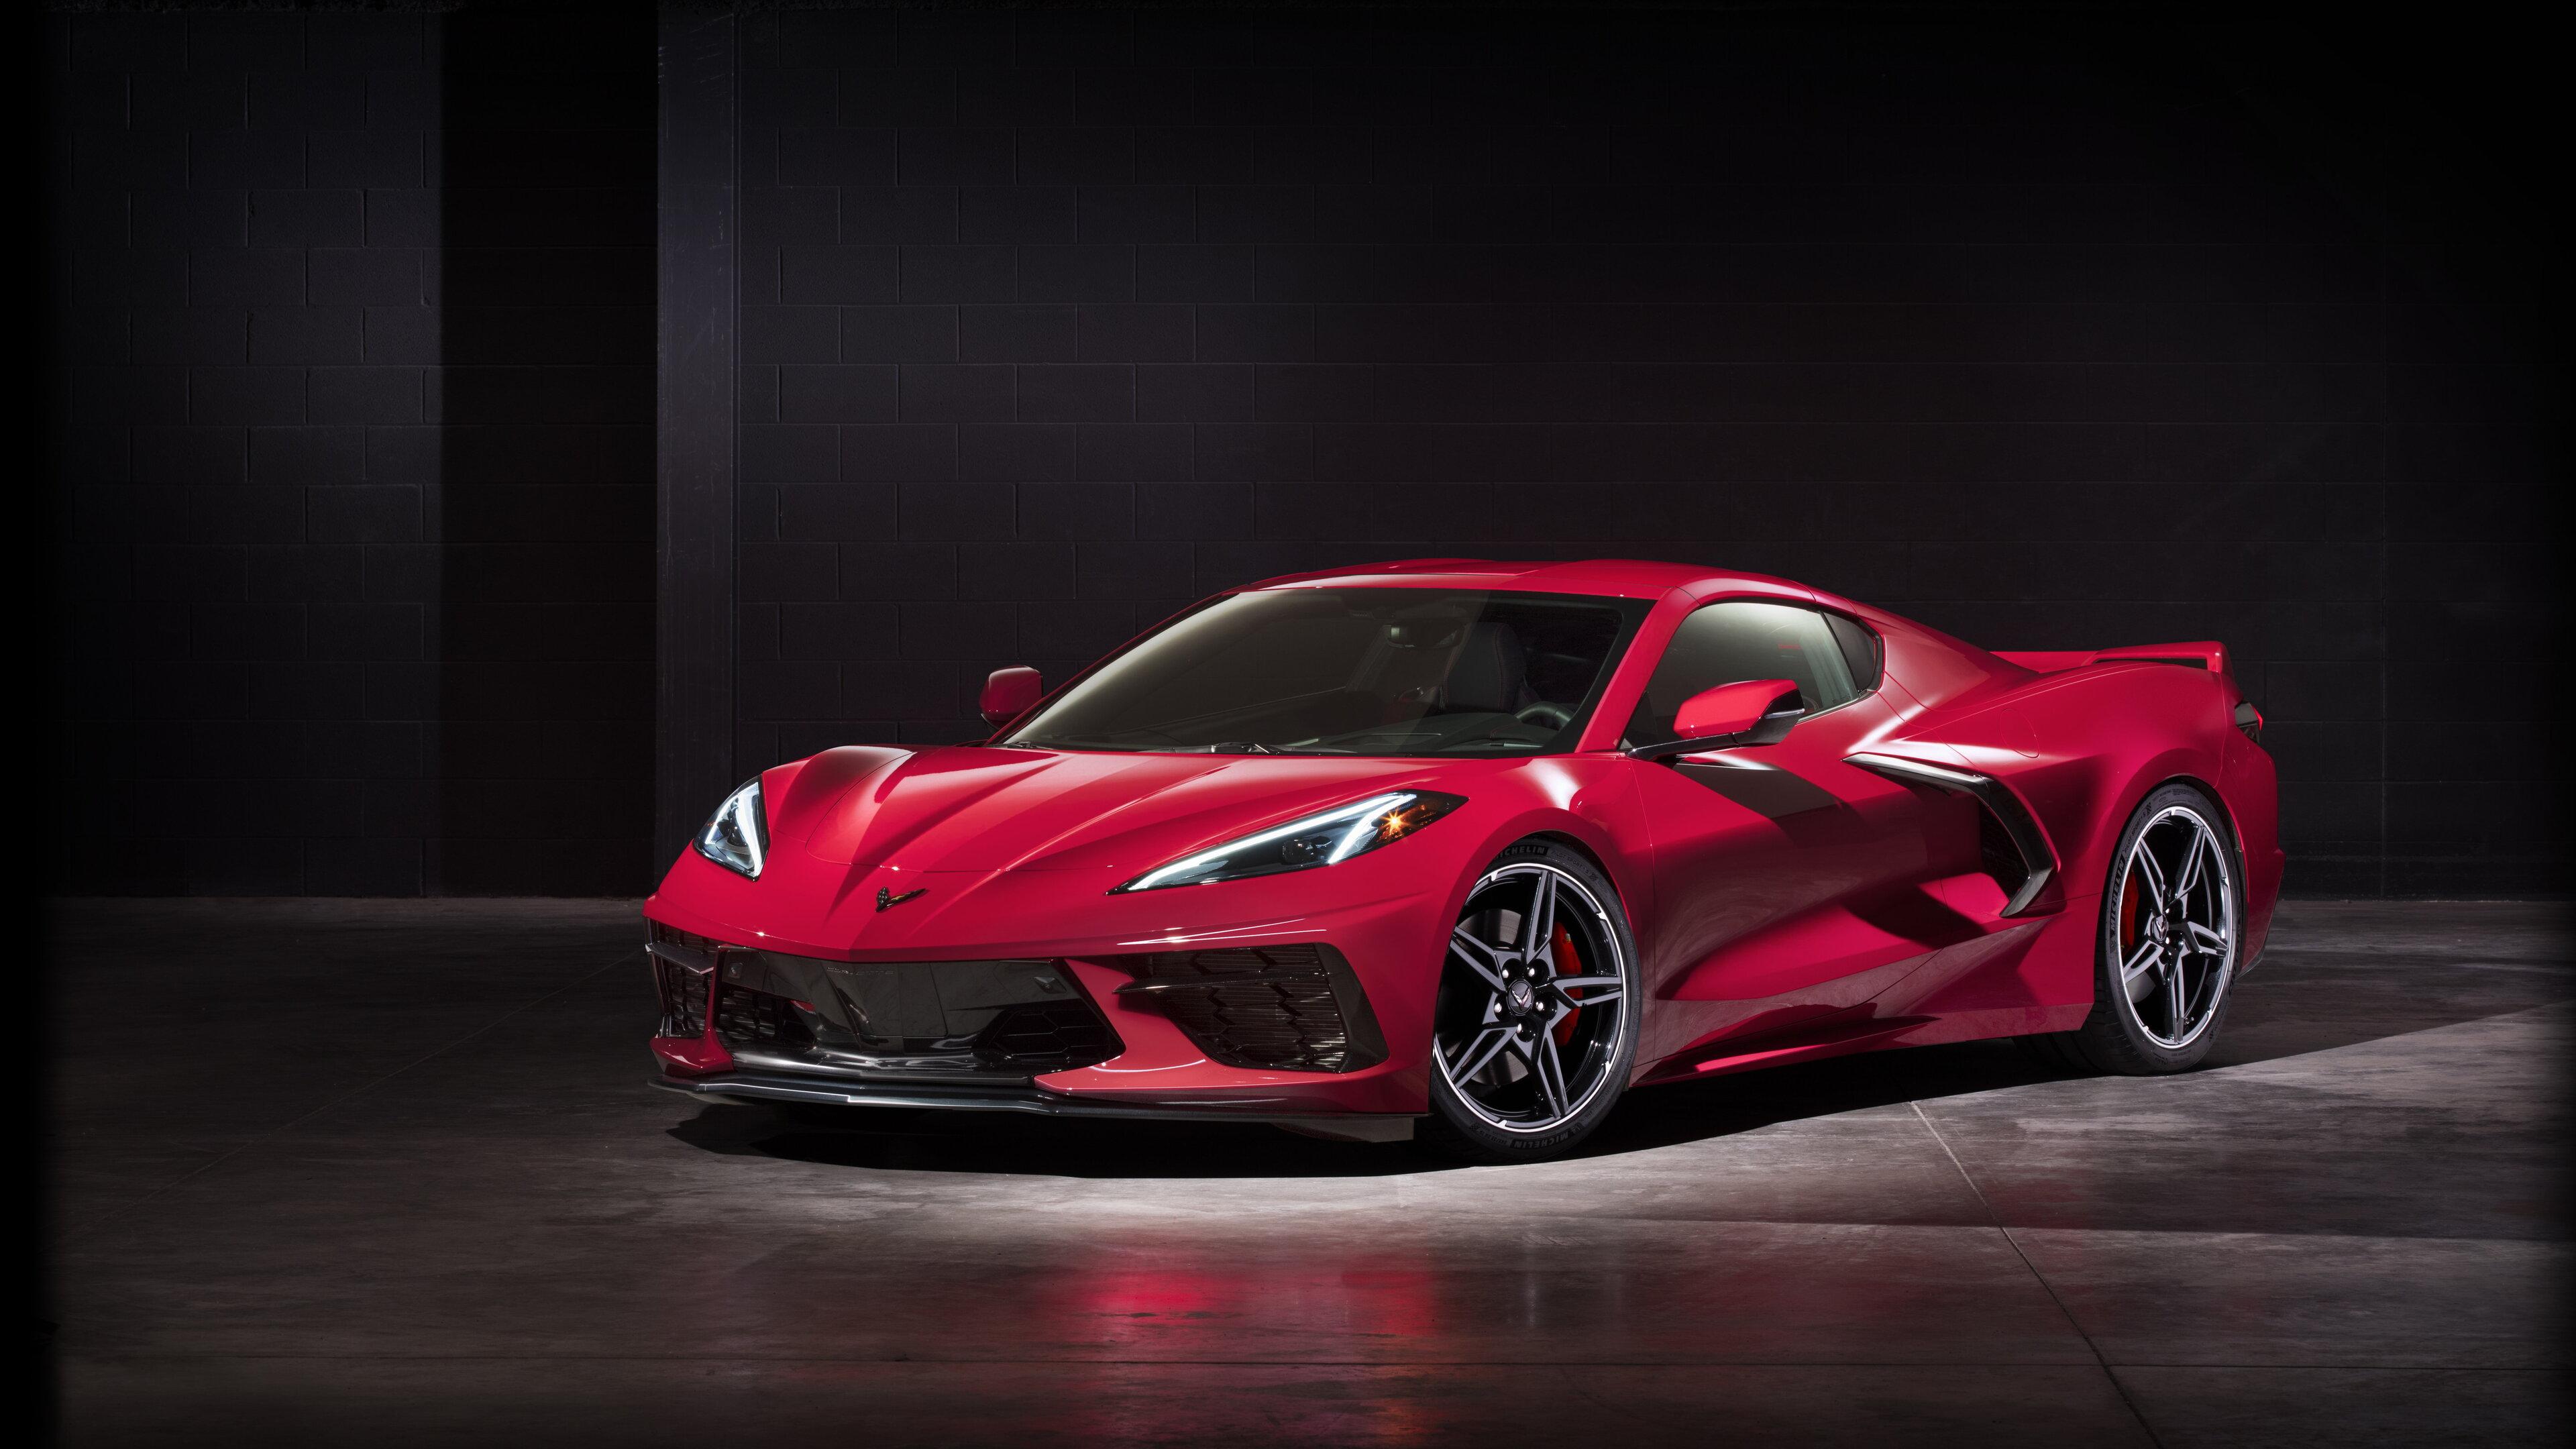 2020-chevy-corvette-stingray-c8-new-bu.jpg